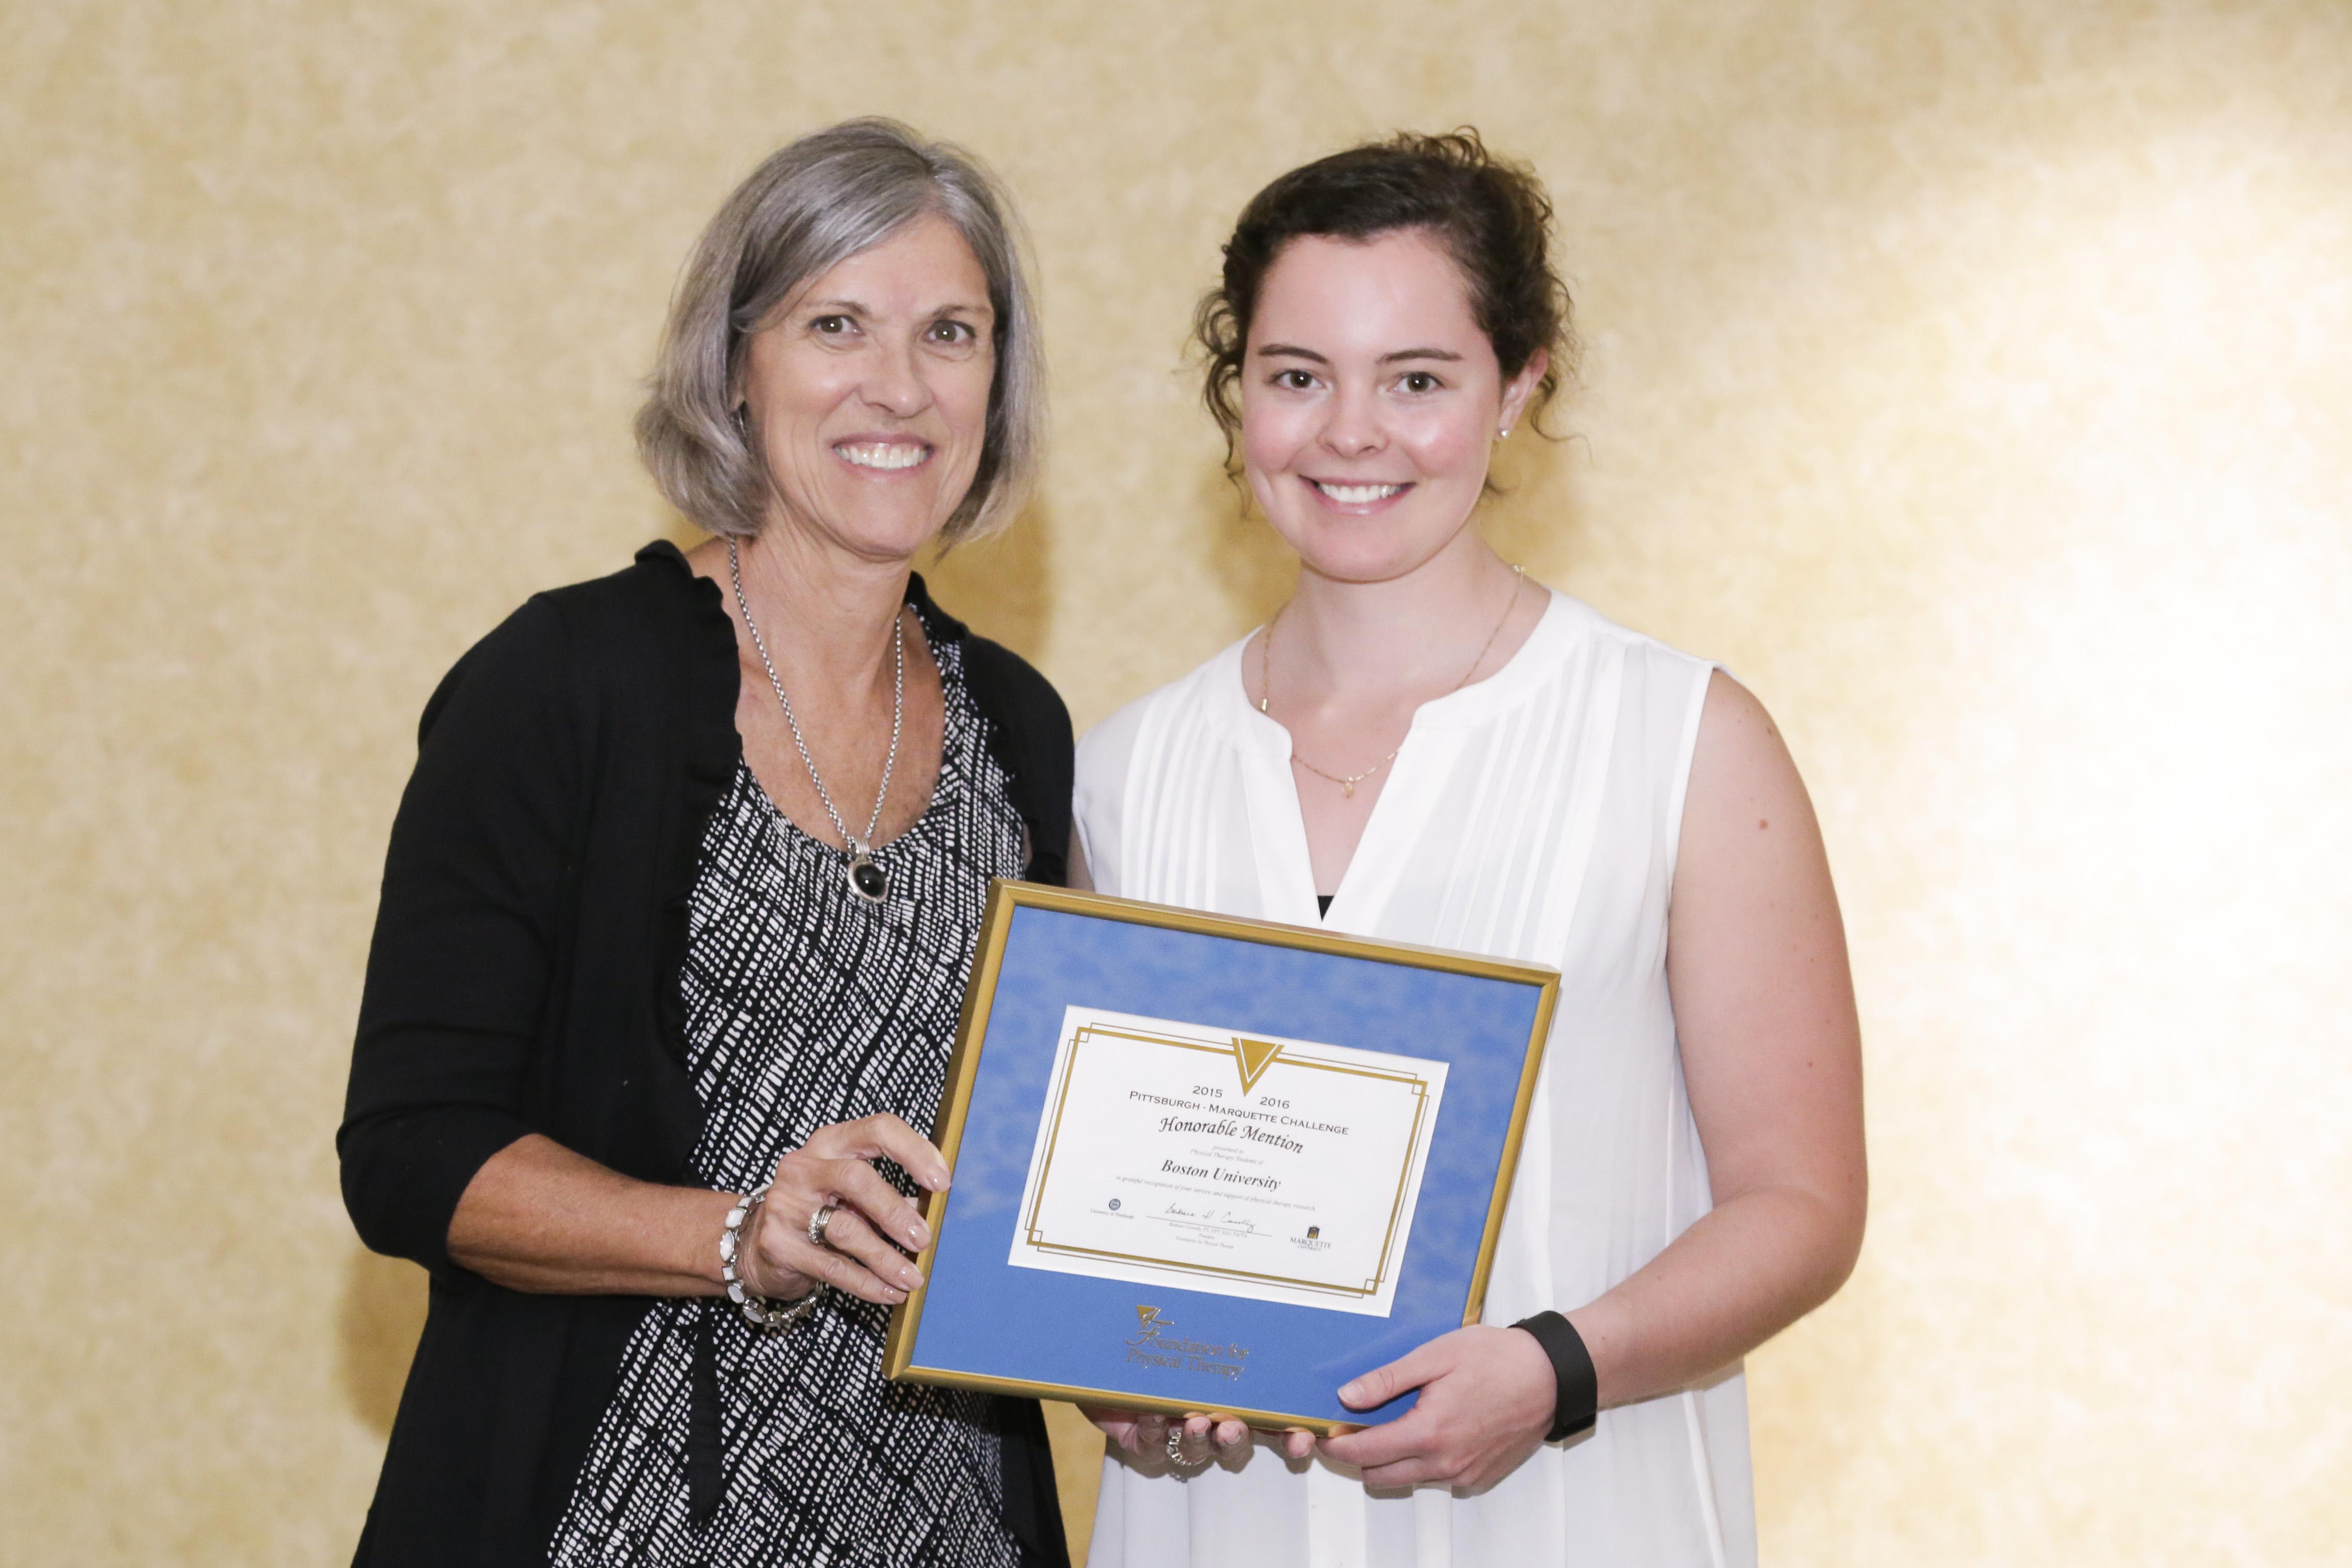 Boston physical therapy university - Boston University Award Photo